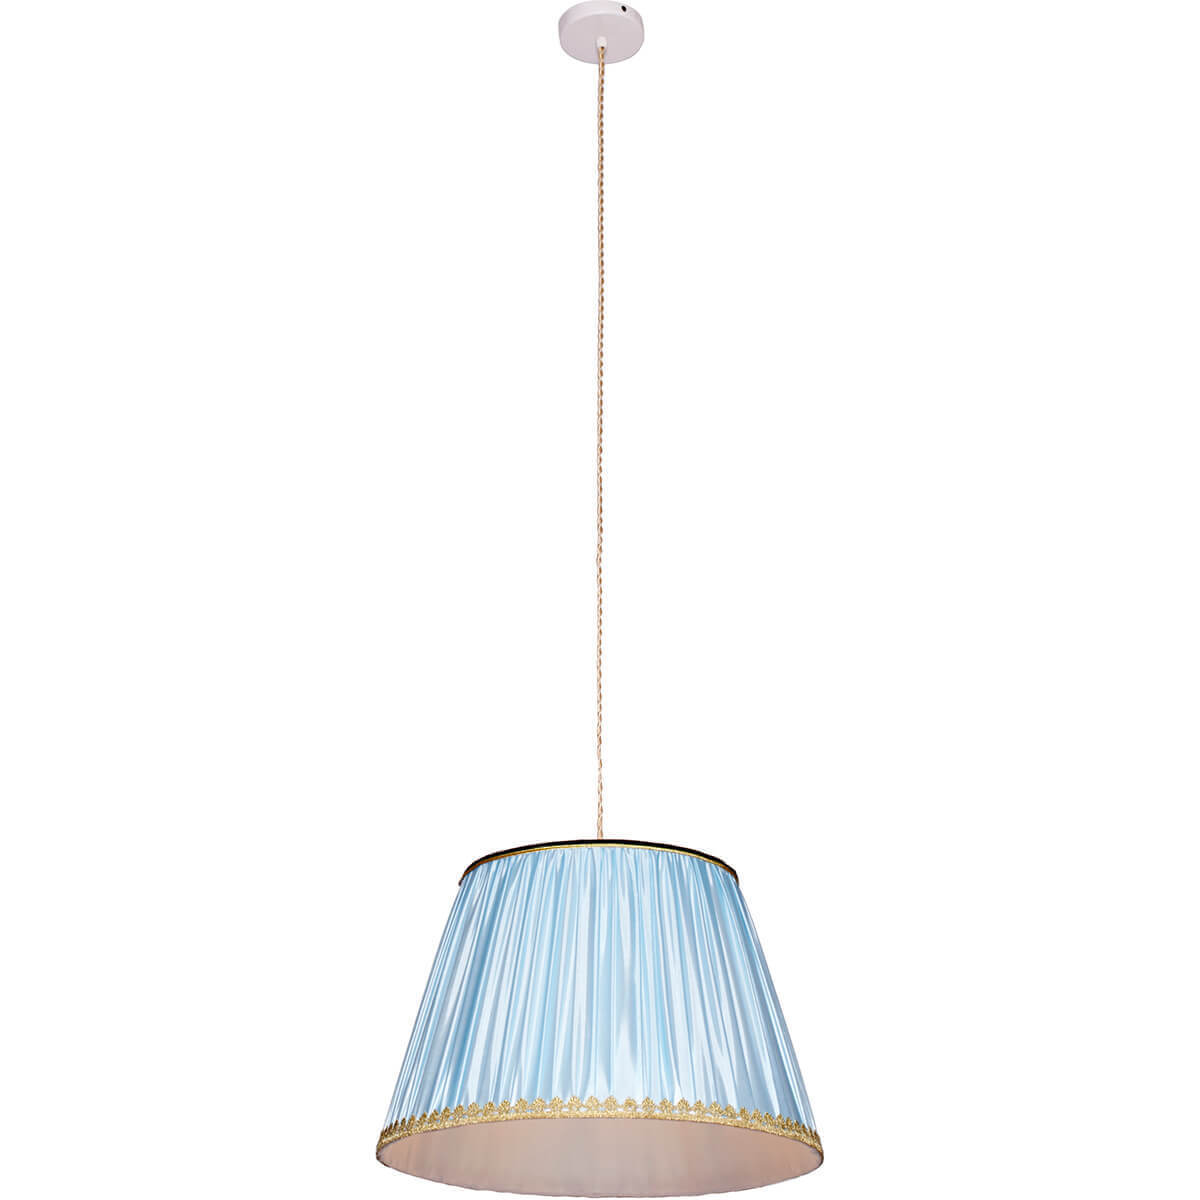 Подвесной светильник Lucia Tucci Lotte 214.1 lotte 56